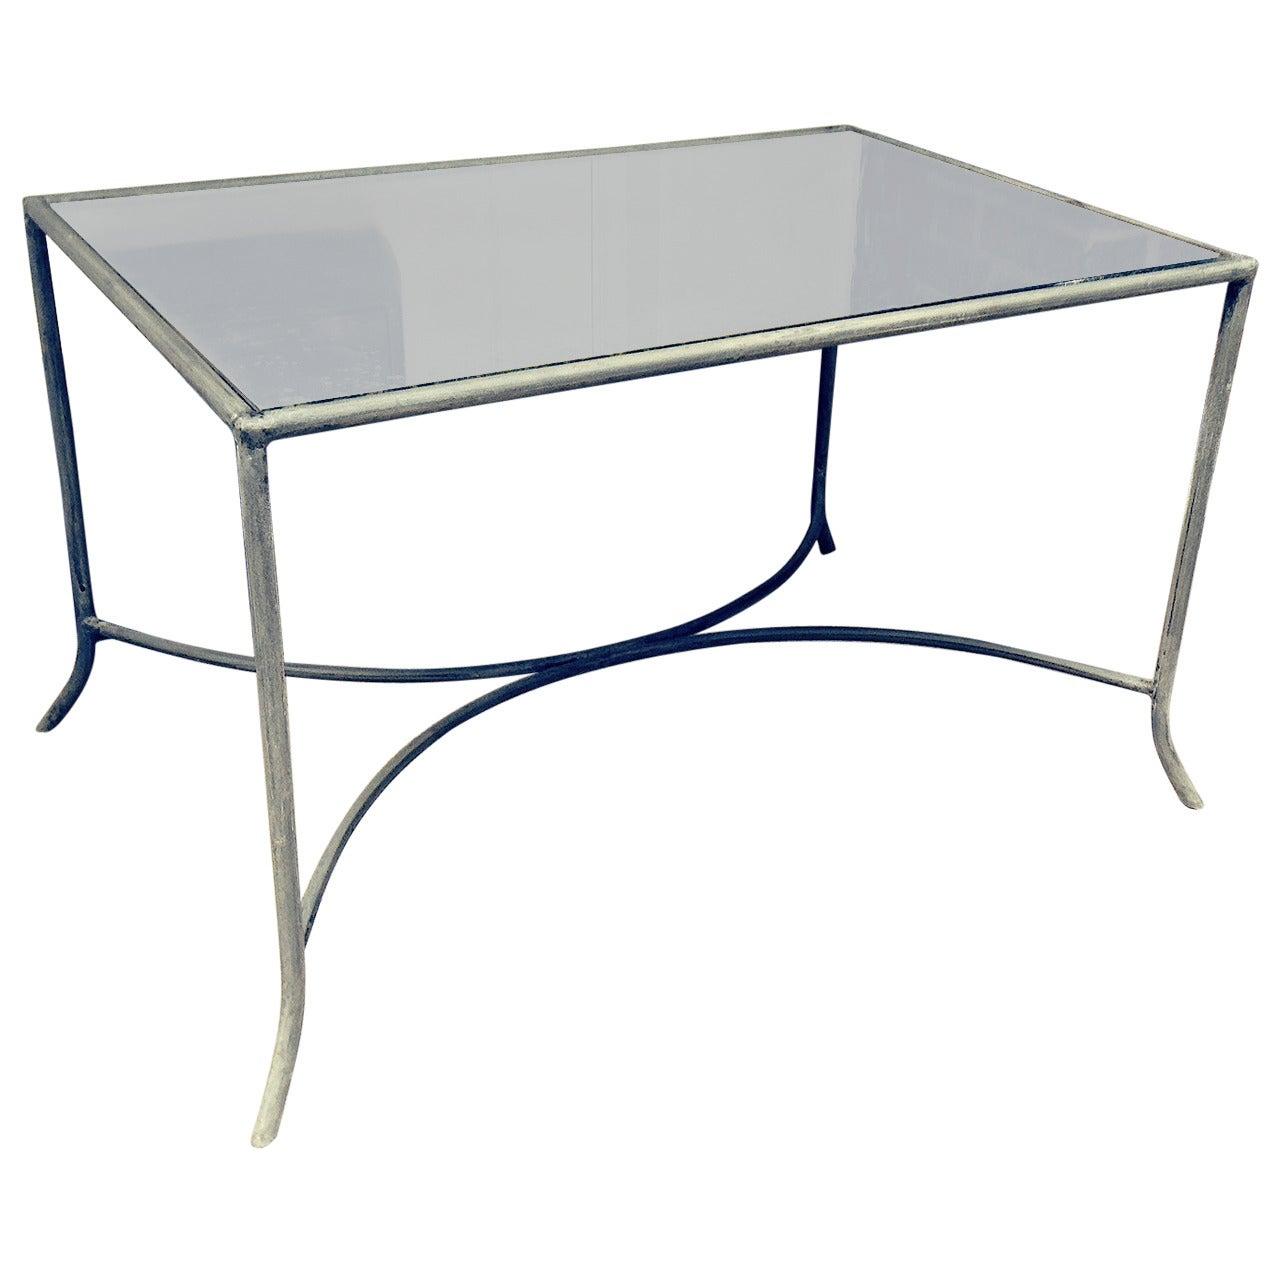 Zinc and Antique Mirror Coffee or Garden Table